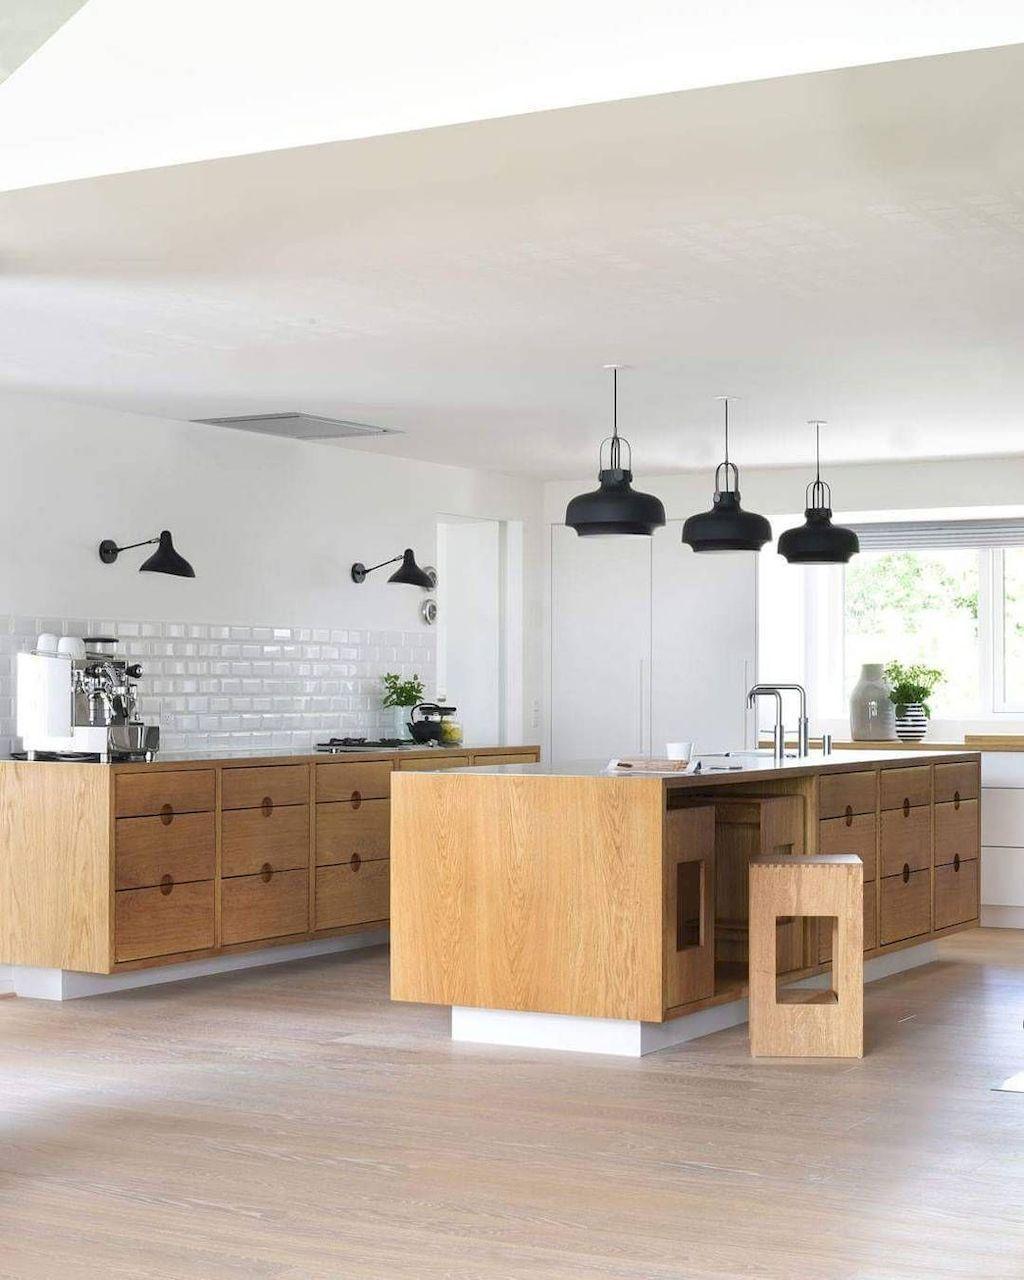 Kitchen Set Scandinavian: 30+ SCANDINAVIAN WITH AWESOME KITCHEN ISLAND IDEAS